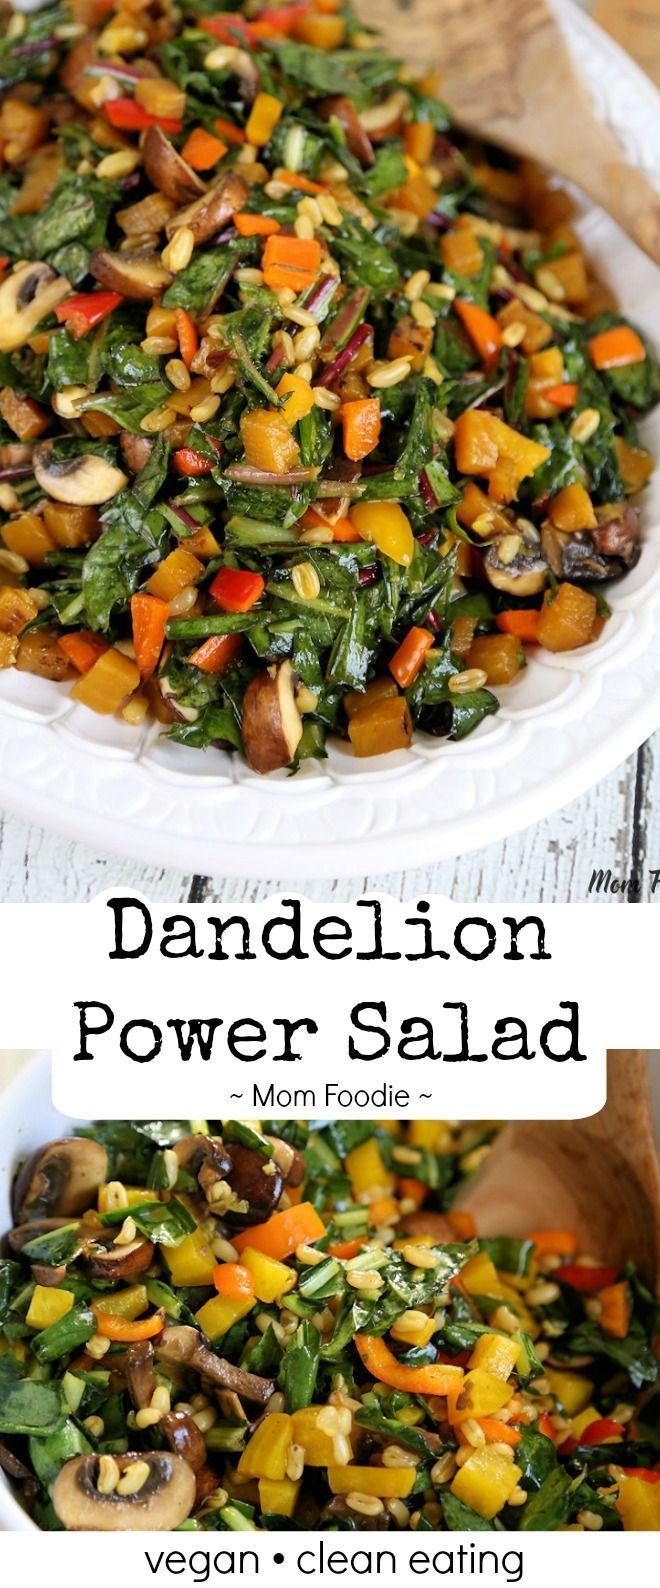 Dandelion Greens salad recipe with golden beets, kamut, mushrooms & sweet peppers - easy dandelion salad dressing. Vegan, Clean Eating